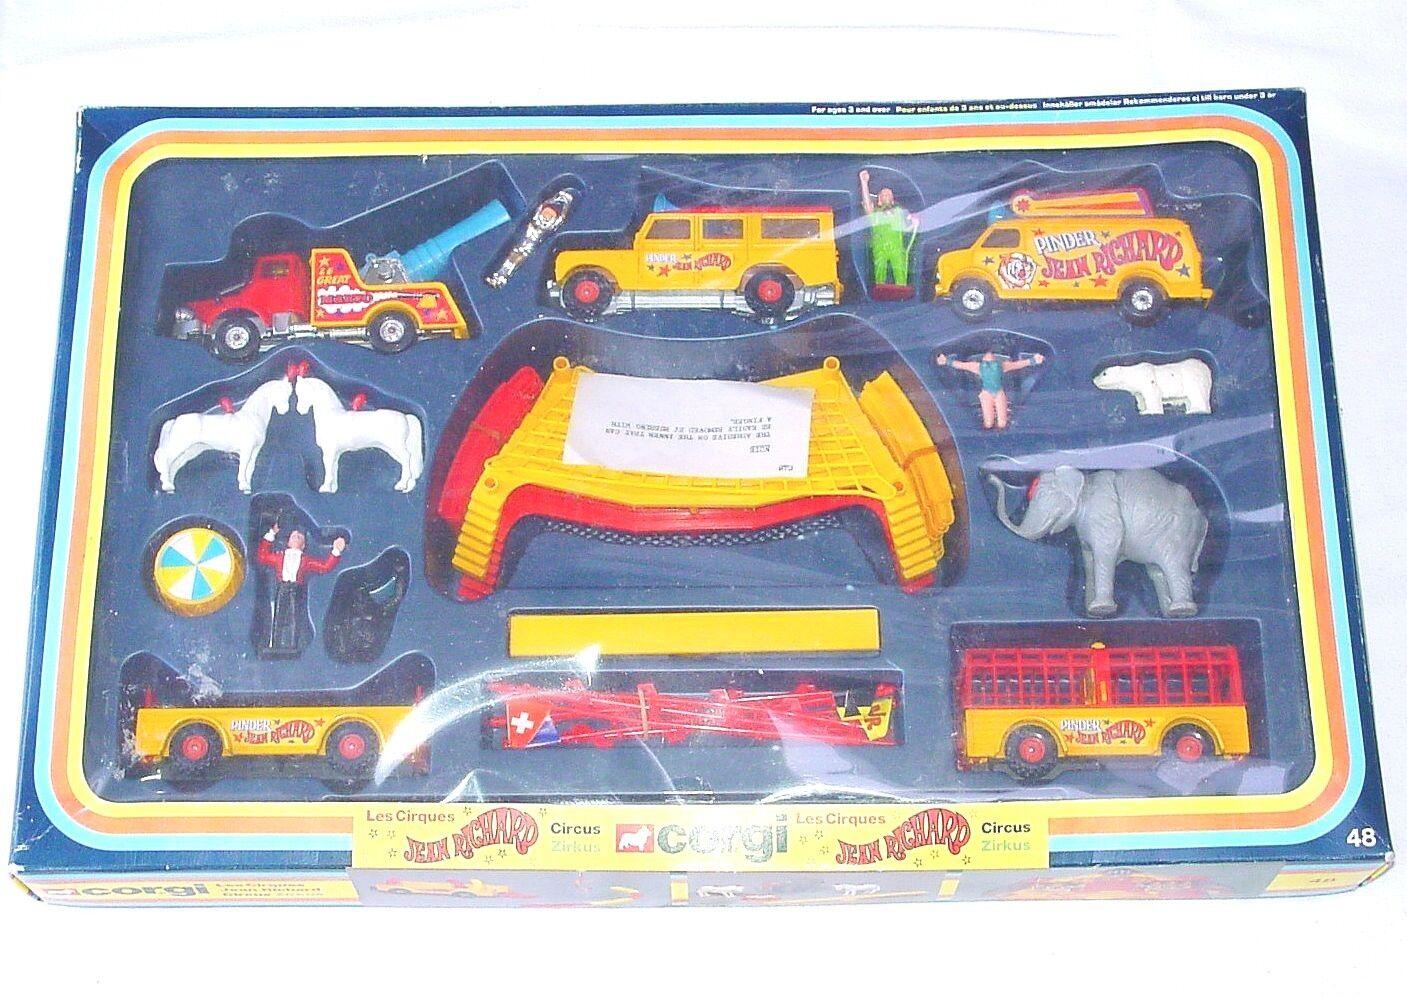 Corgi Toys 1 35 CIRCUS JEAN RICHARD + VEHICLES + ACROBATS + CLOWN + TENT NMIB`78